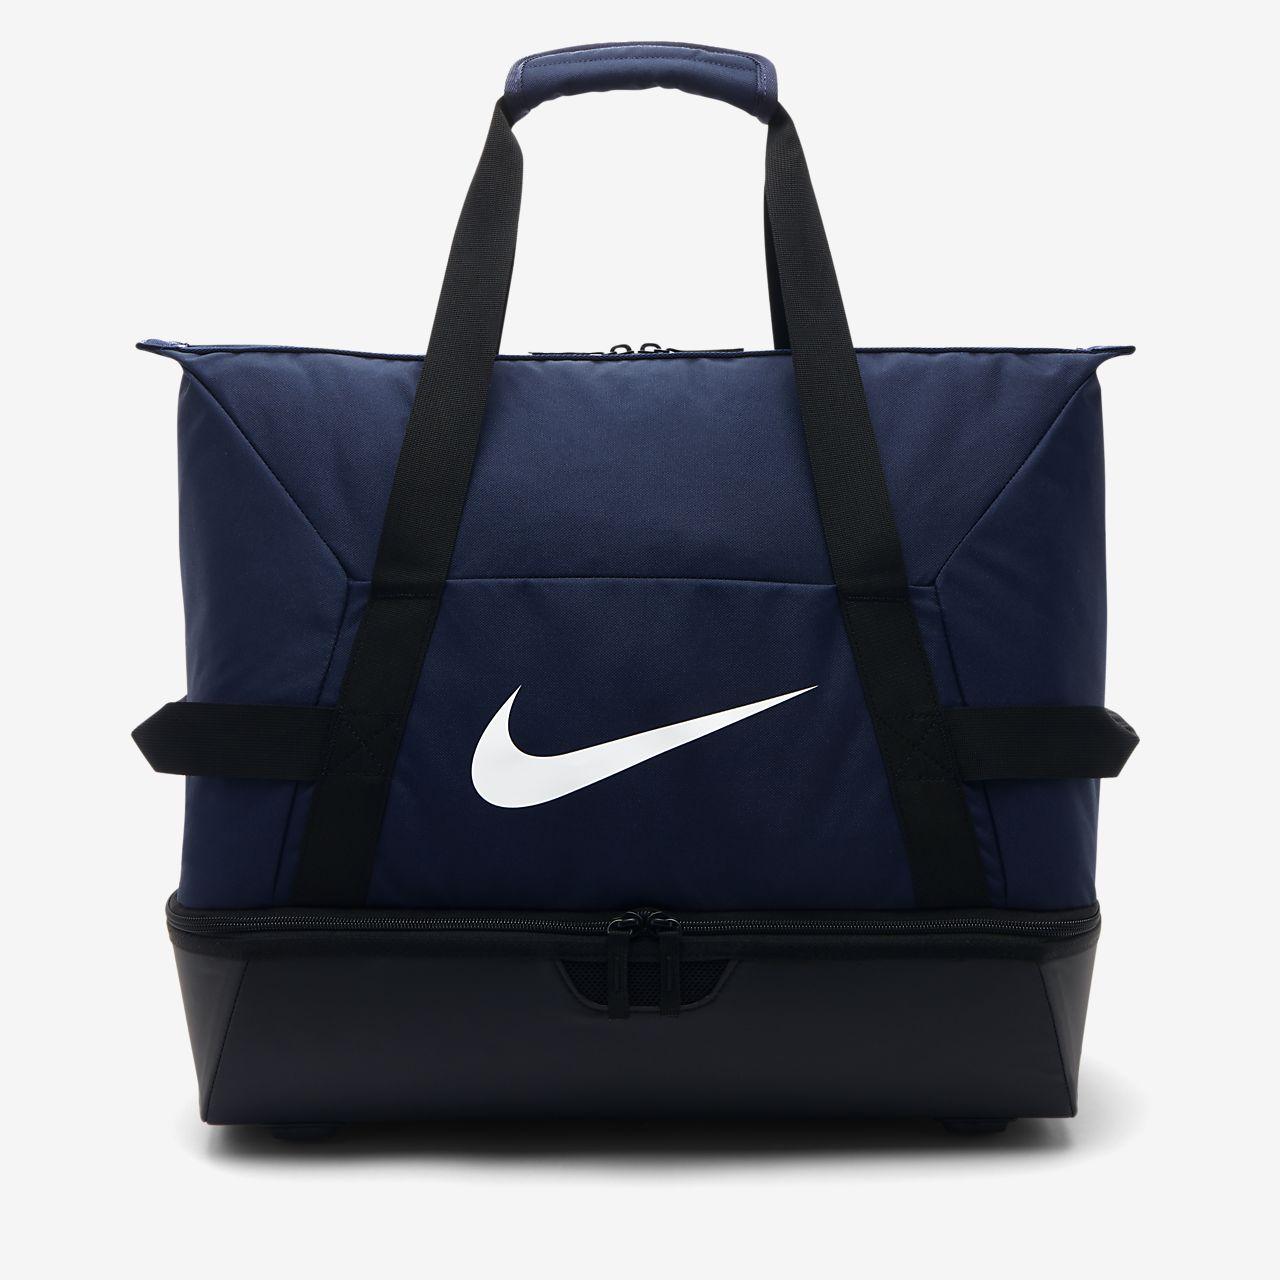 5718648bb45e7 Nike Academy Team Hardcase Fußball-Sporttasche (Medium). Nike.com AT